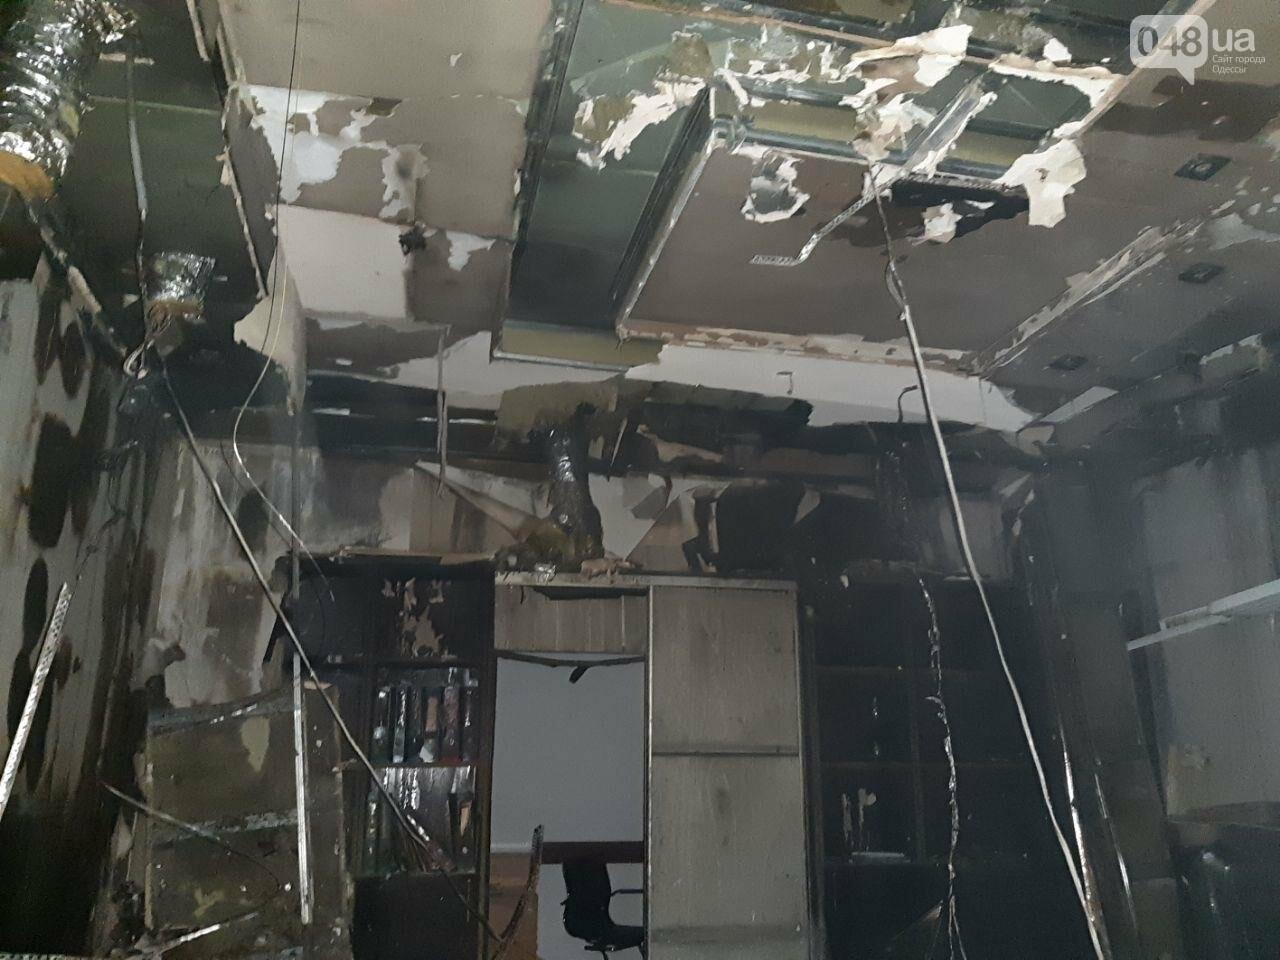 В Одессе горел завод, на котором лепят пельмени,- ФОТО1